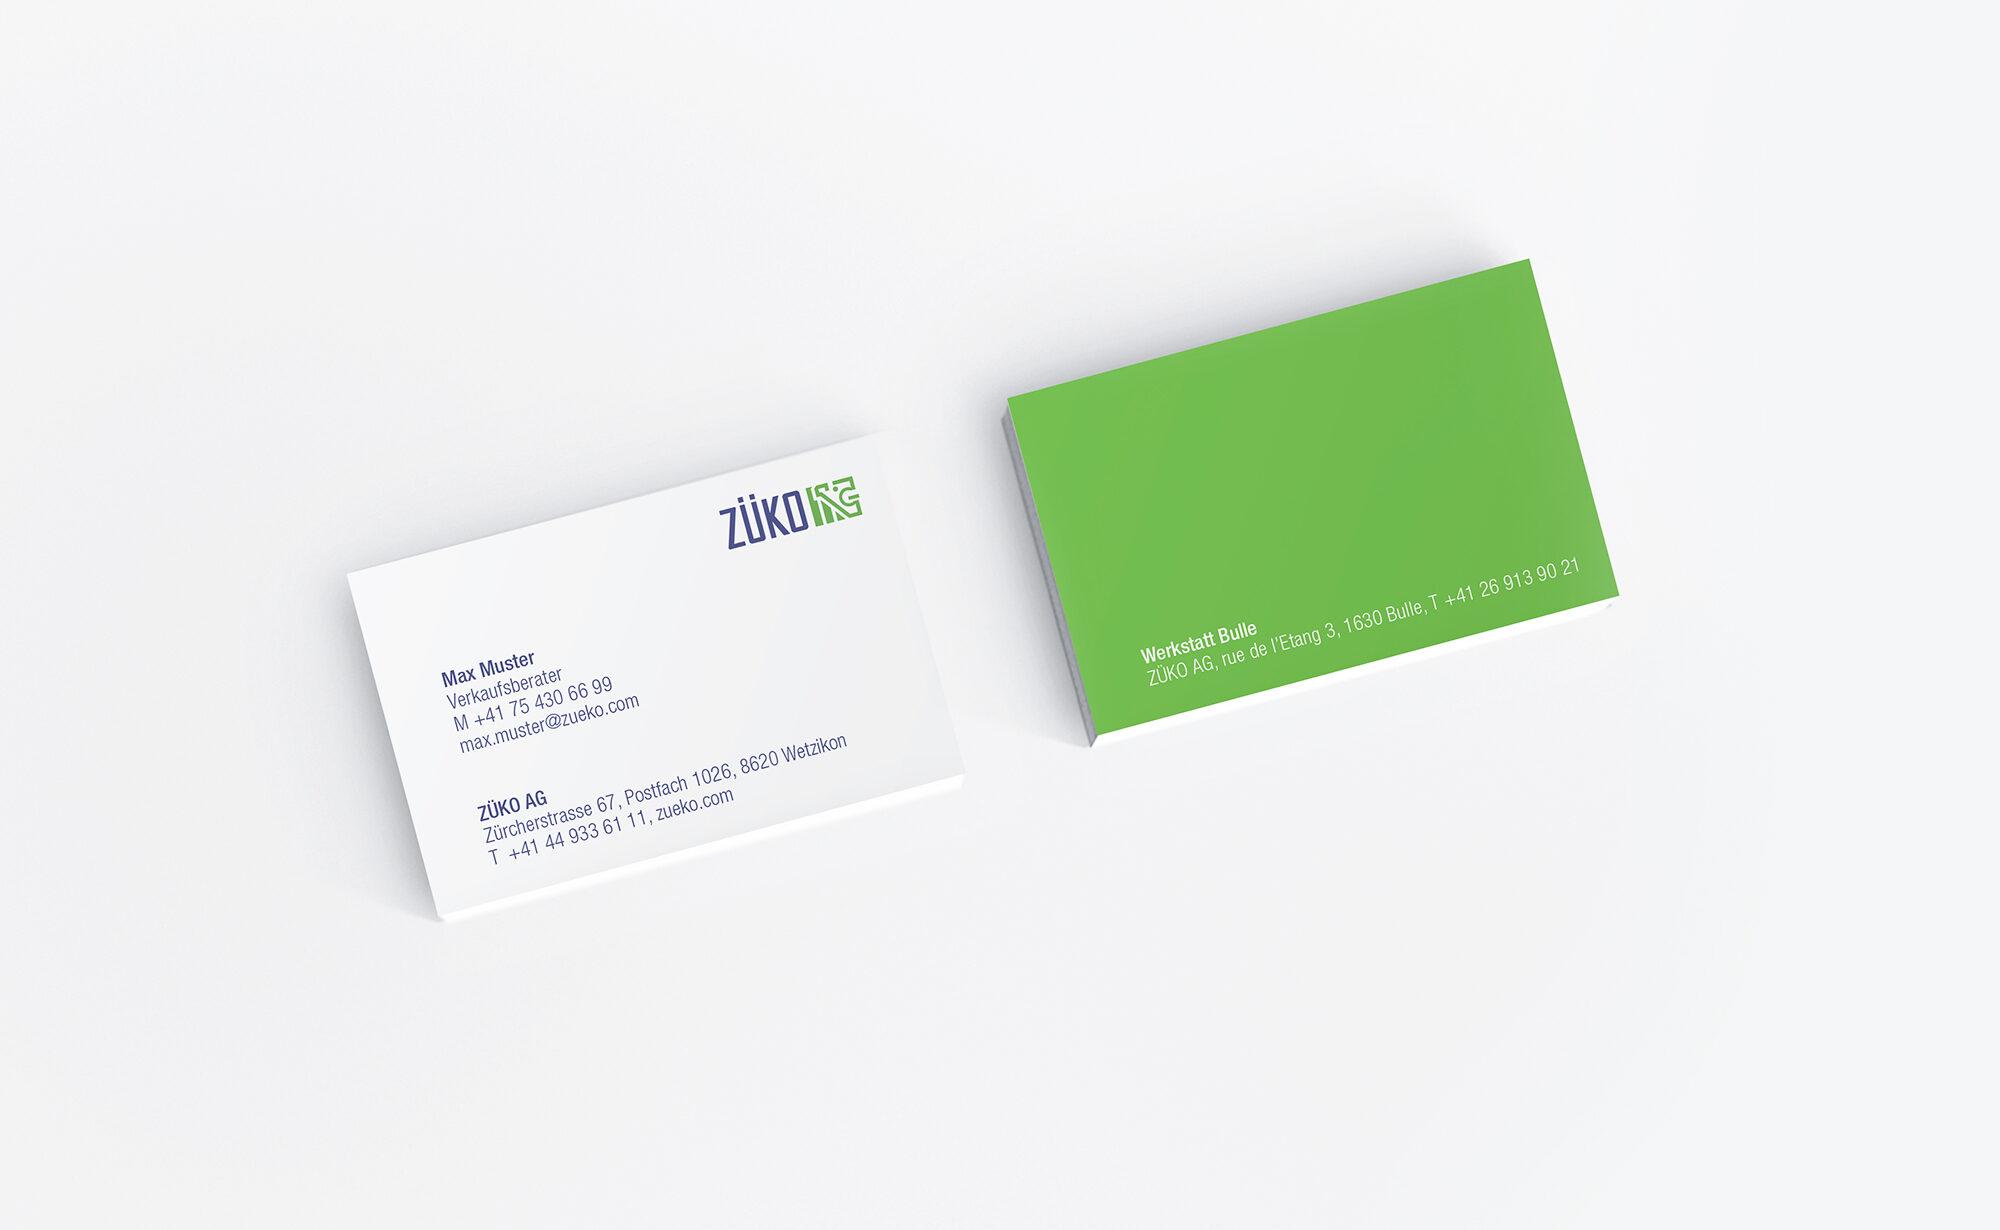 ZÜKO AG Visitenkarte, ZÜKO Corporate Design